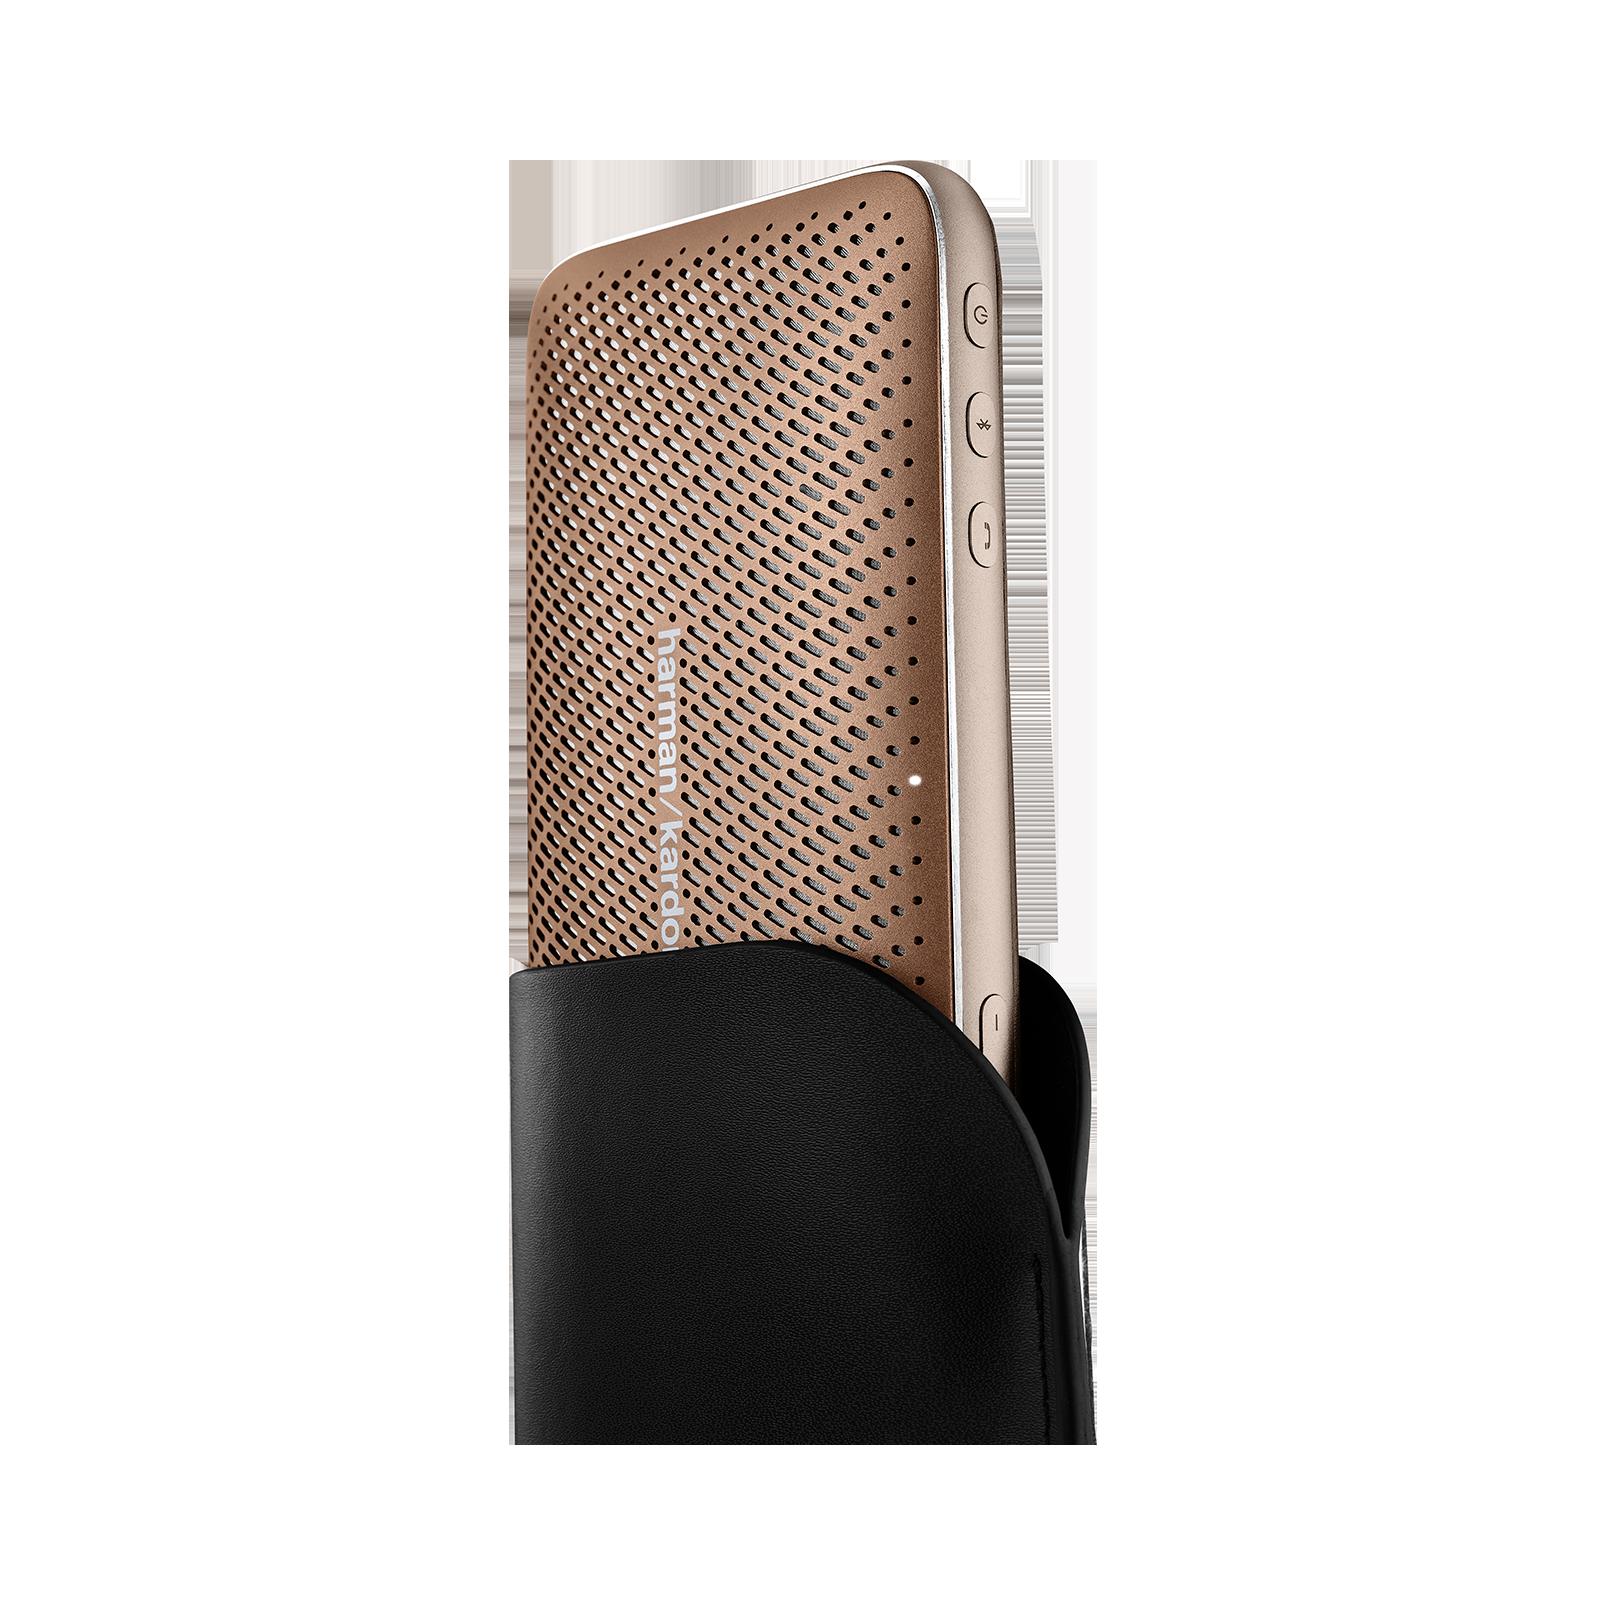 Harman Kardon Esquire Mini 2 - Brown - Ultra-slim and portable premium Bluetooth Speaker - Detailshot 1